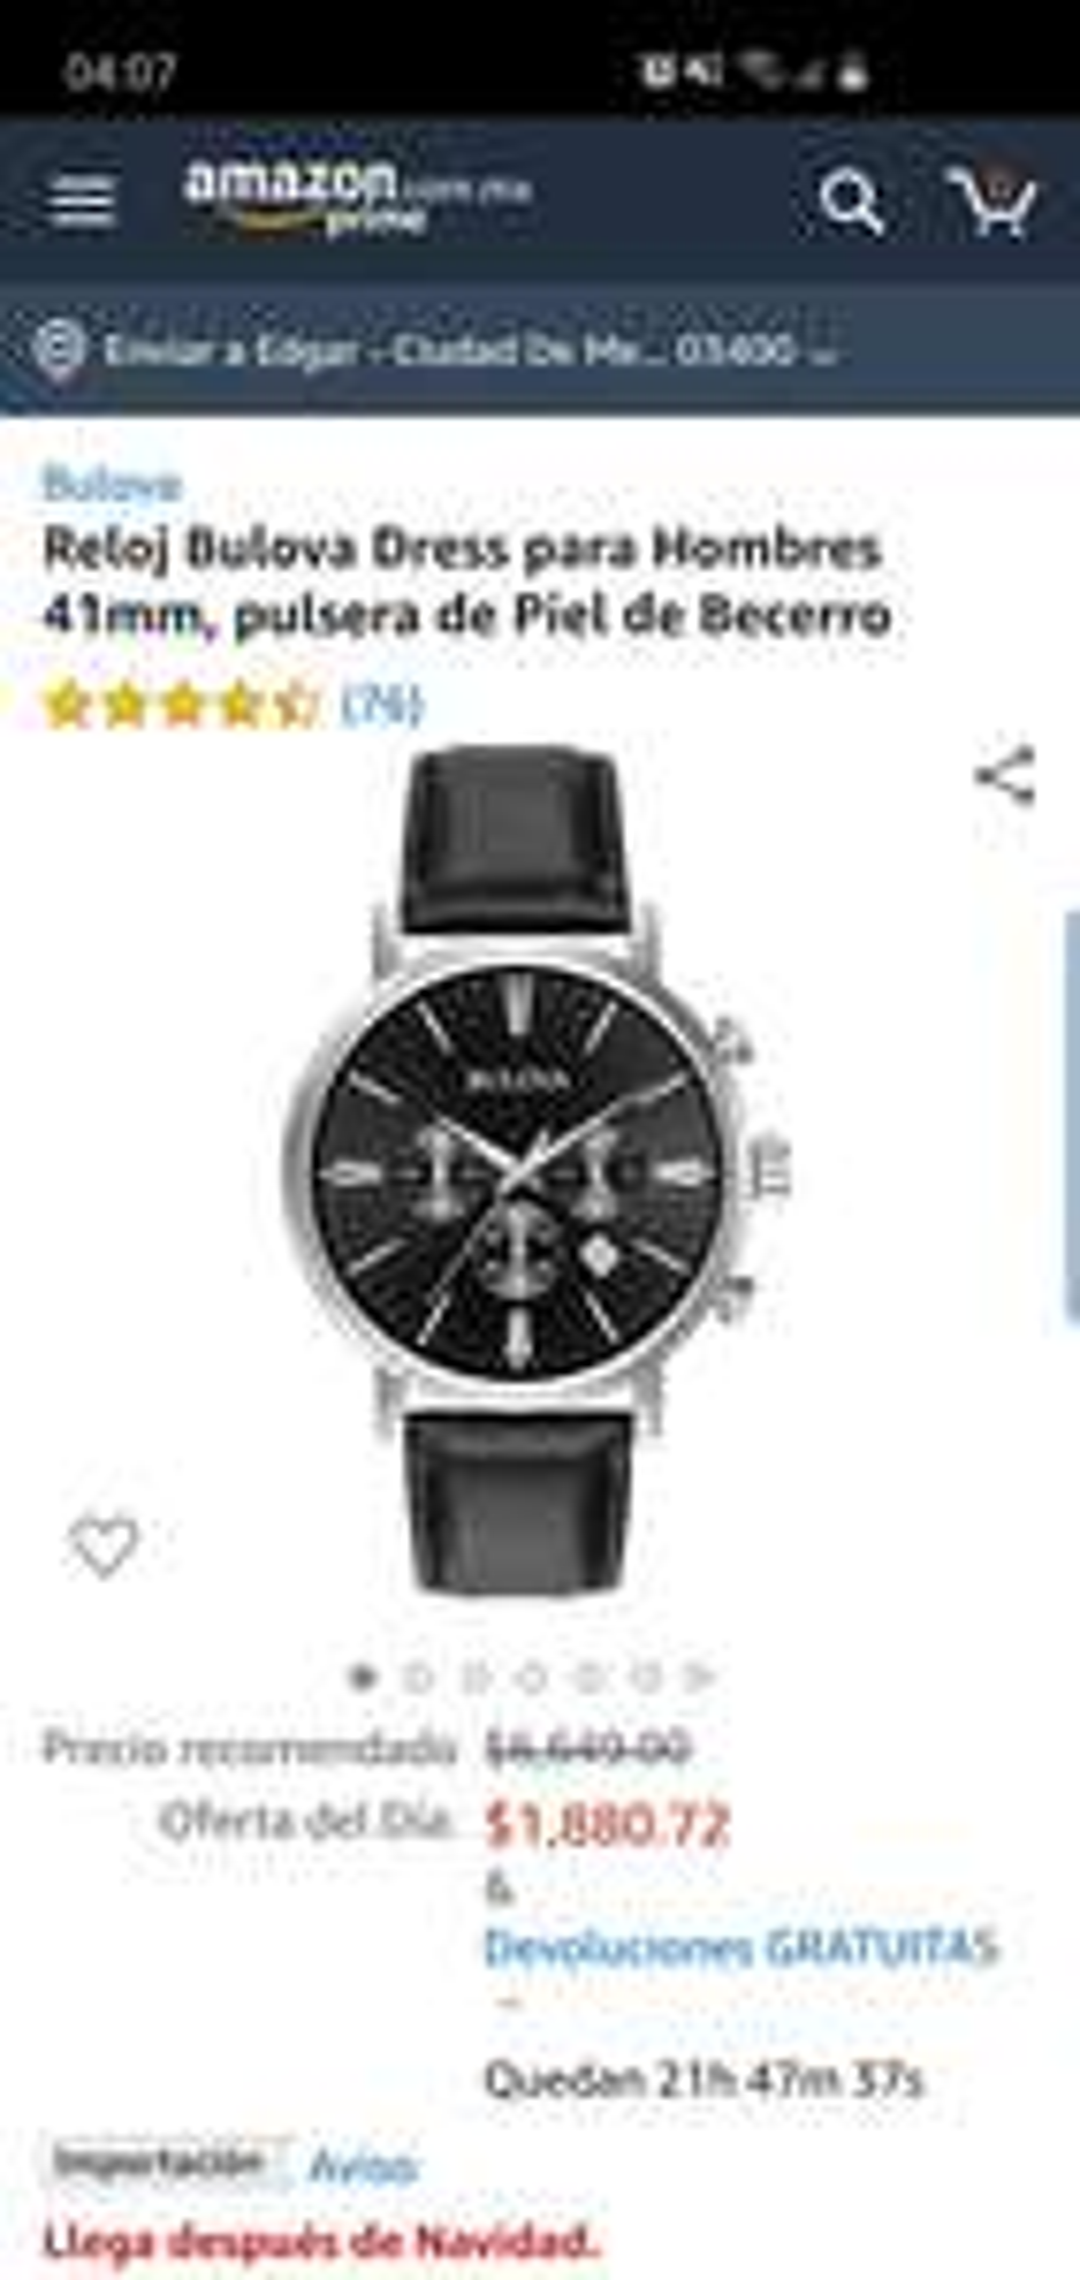 Amazon Reloj Bulova Dress para Hombres 41mm, pulsera de Piel de Becerro